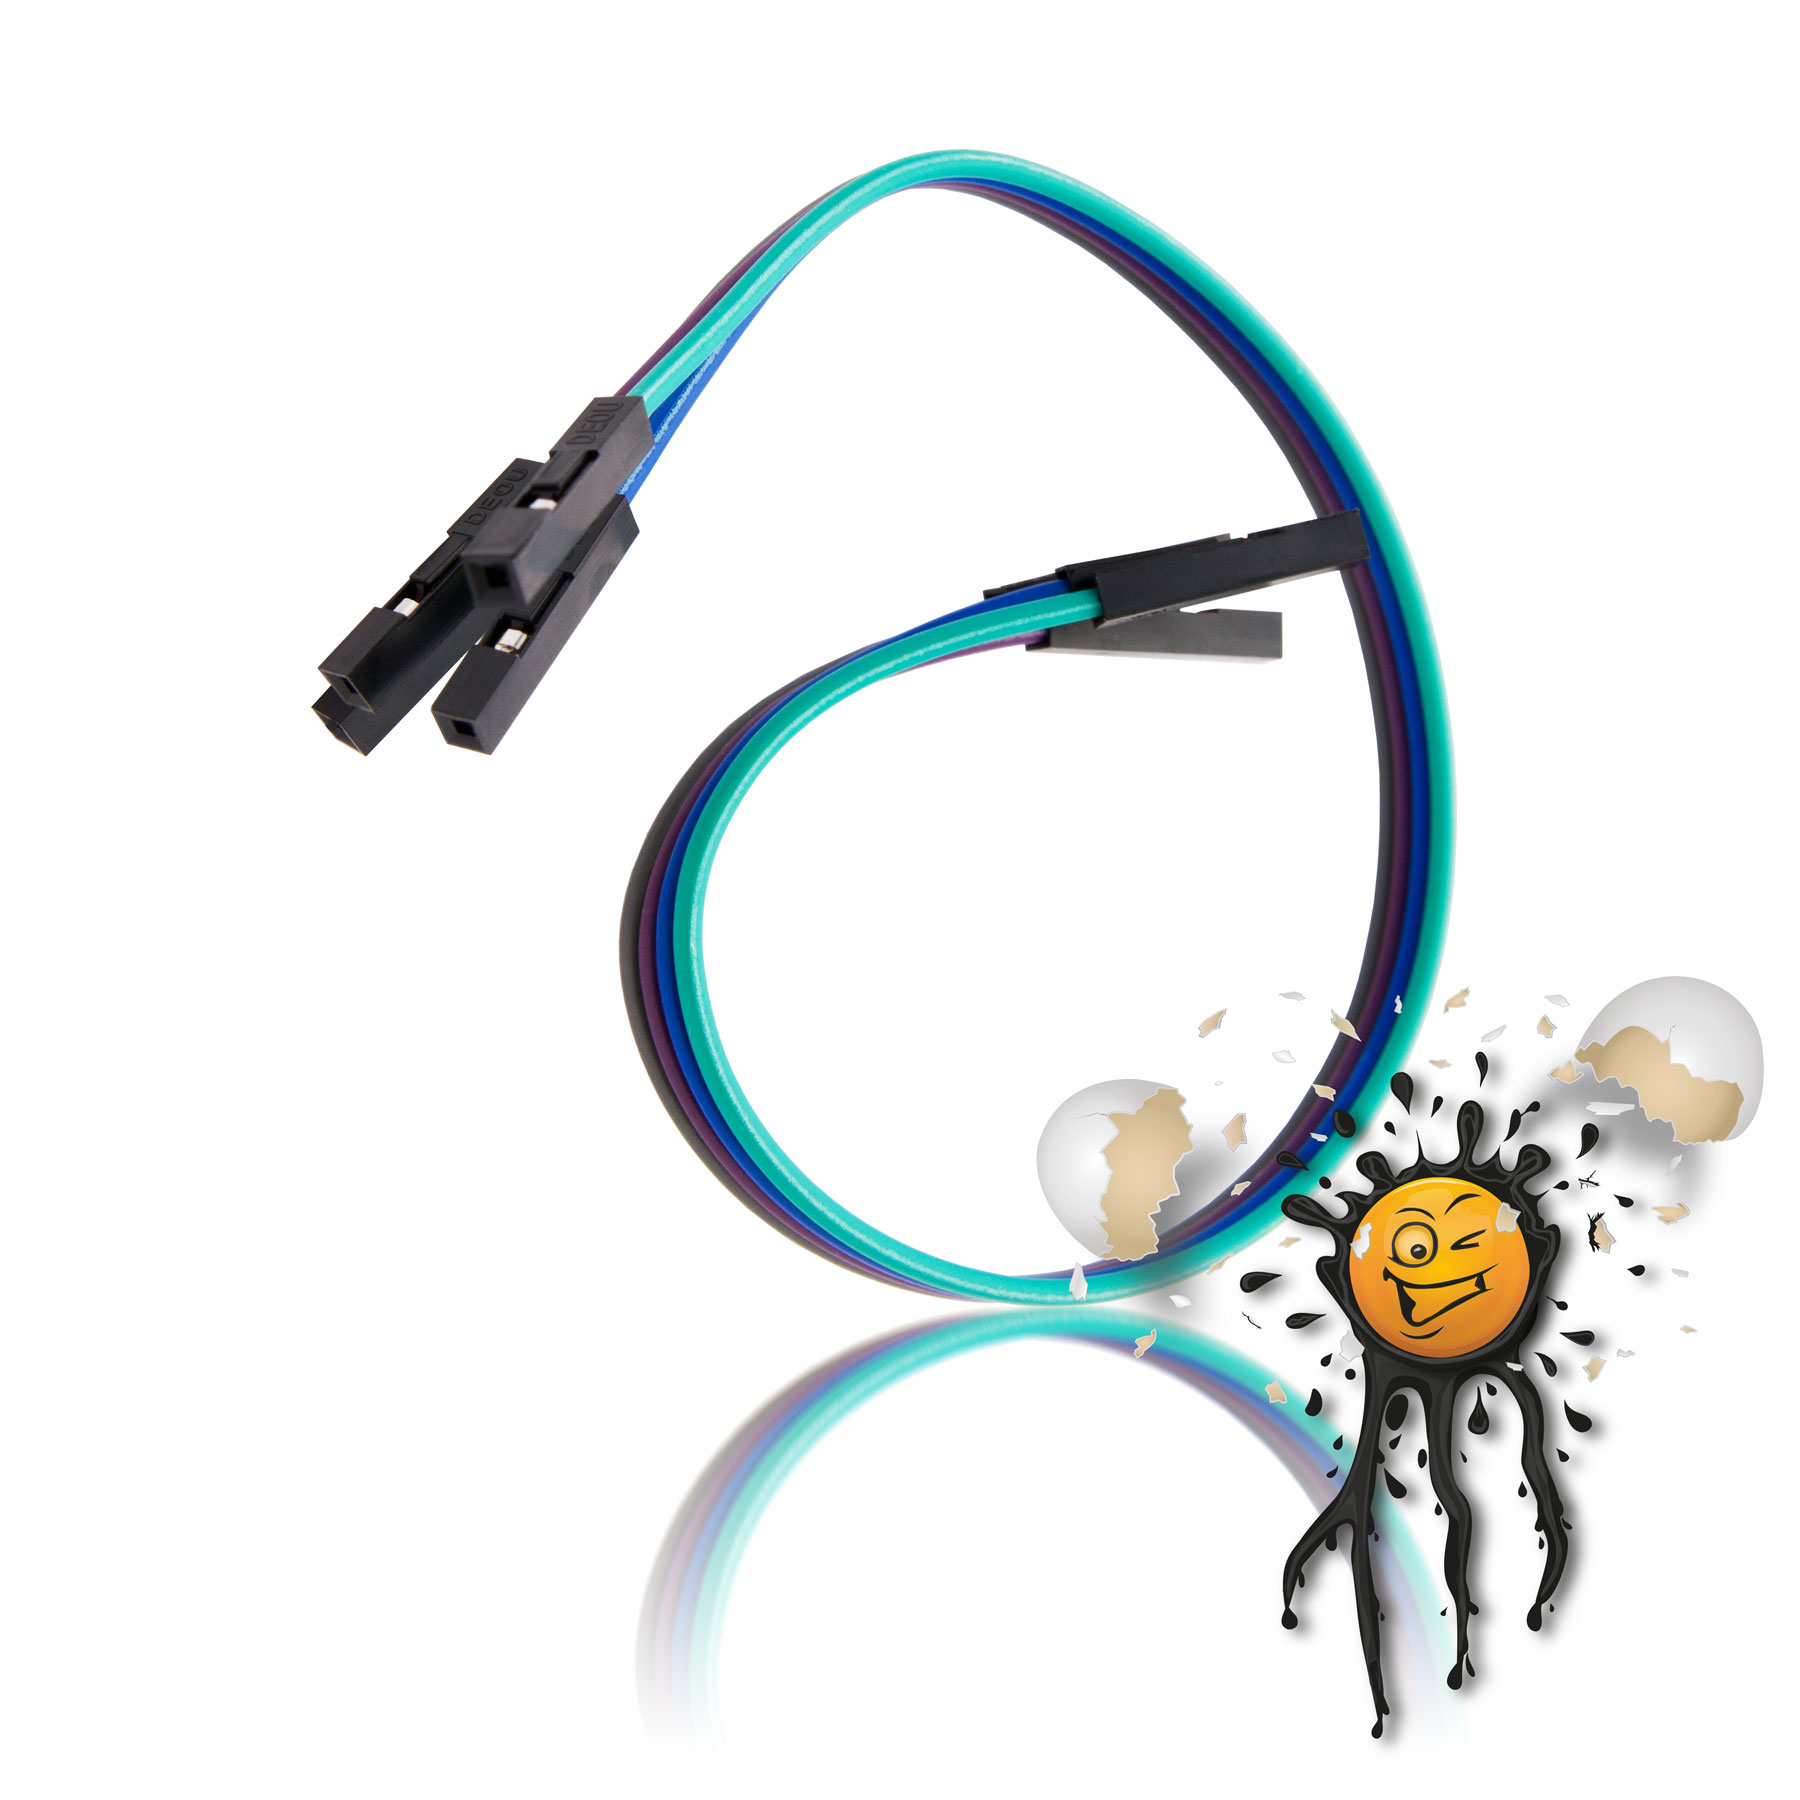 Kabel für JTAG Konverter